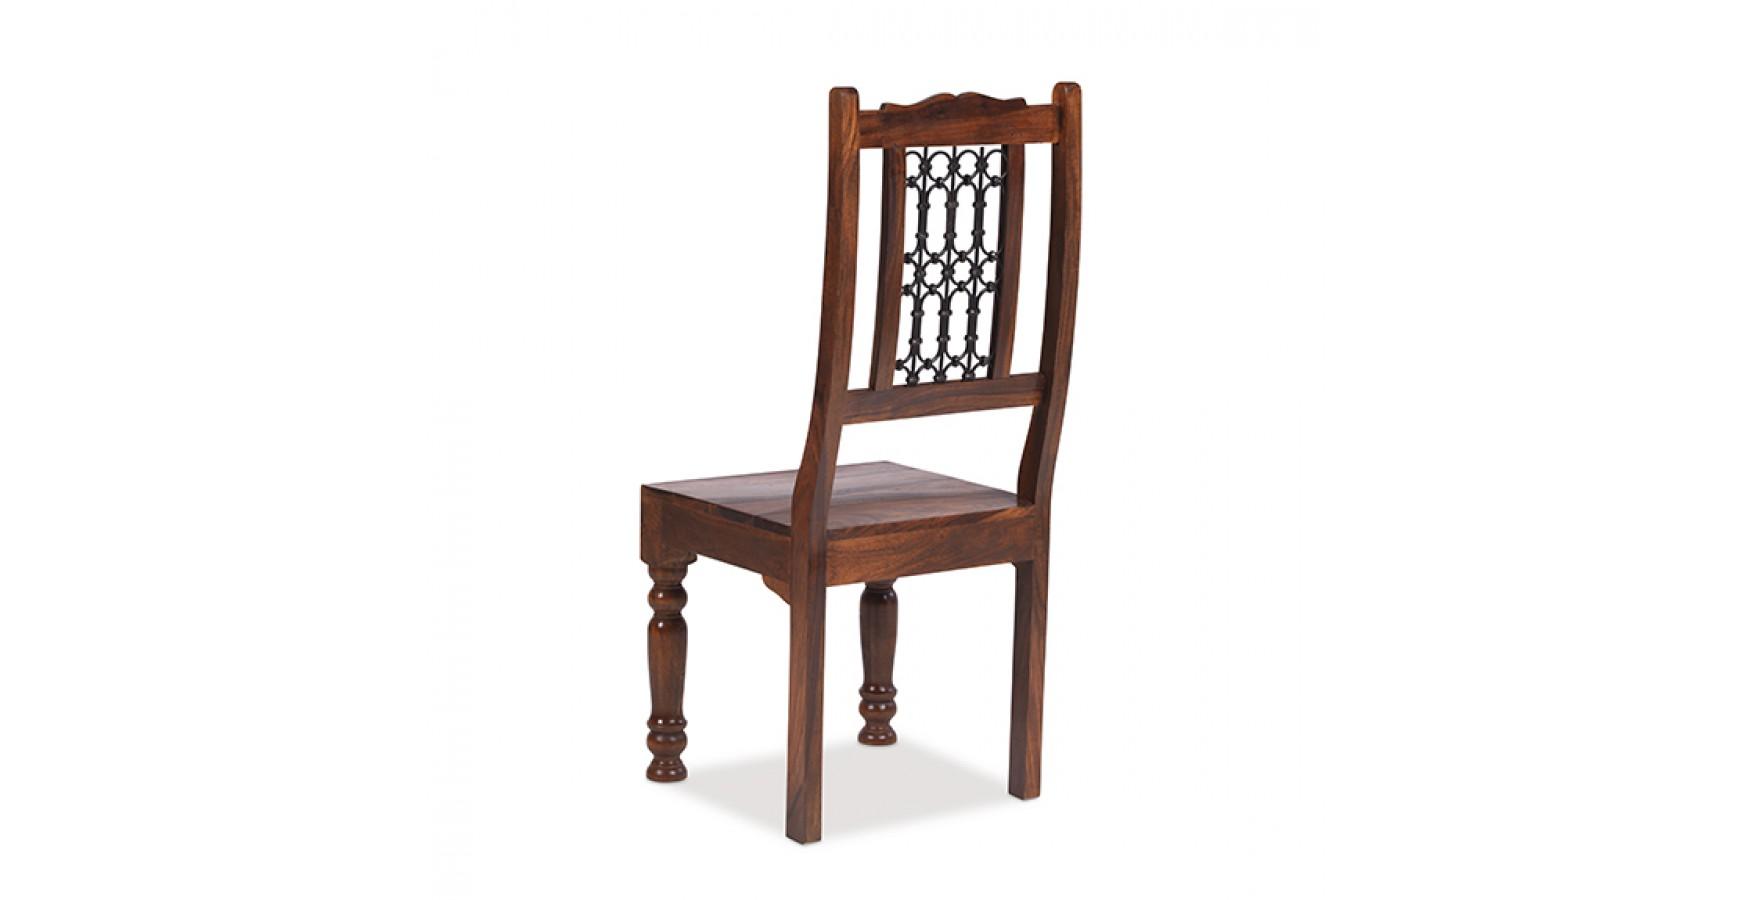 Dining Chairs Dining Room Furniture SouthBlack  : jali sheesham low back jali chair 11 from leparadisduson.com size 1750 x 900 jpeg 75kB